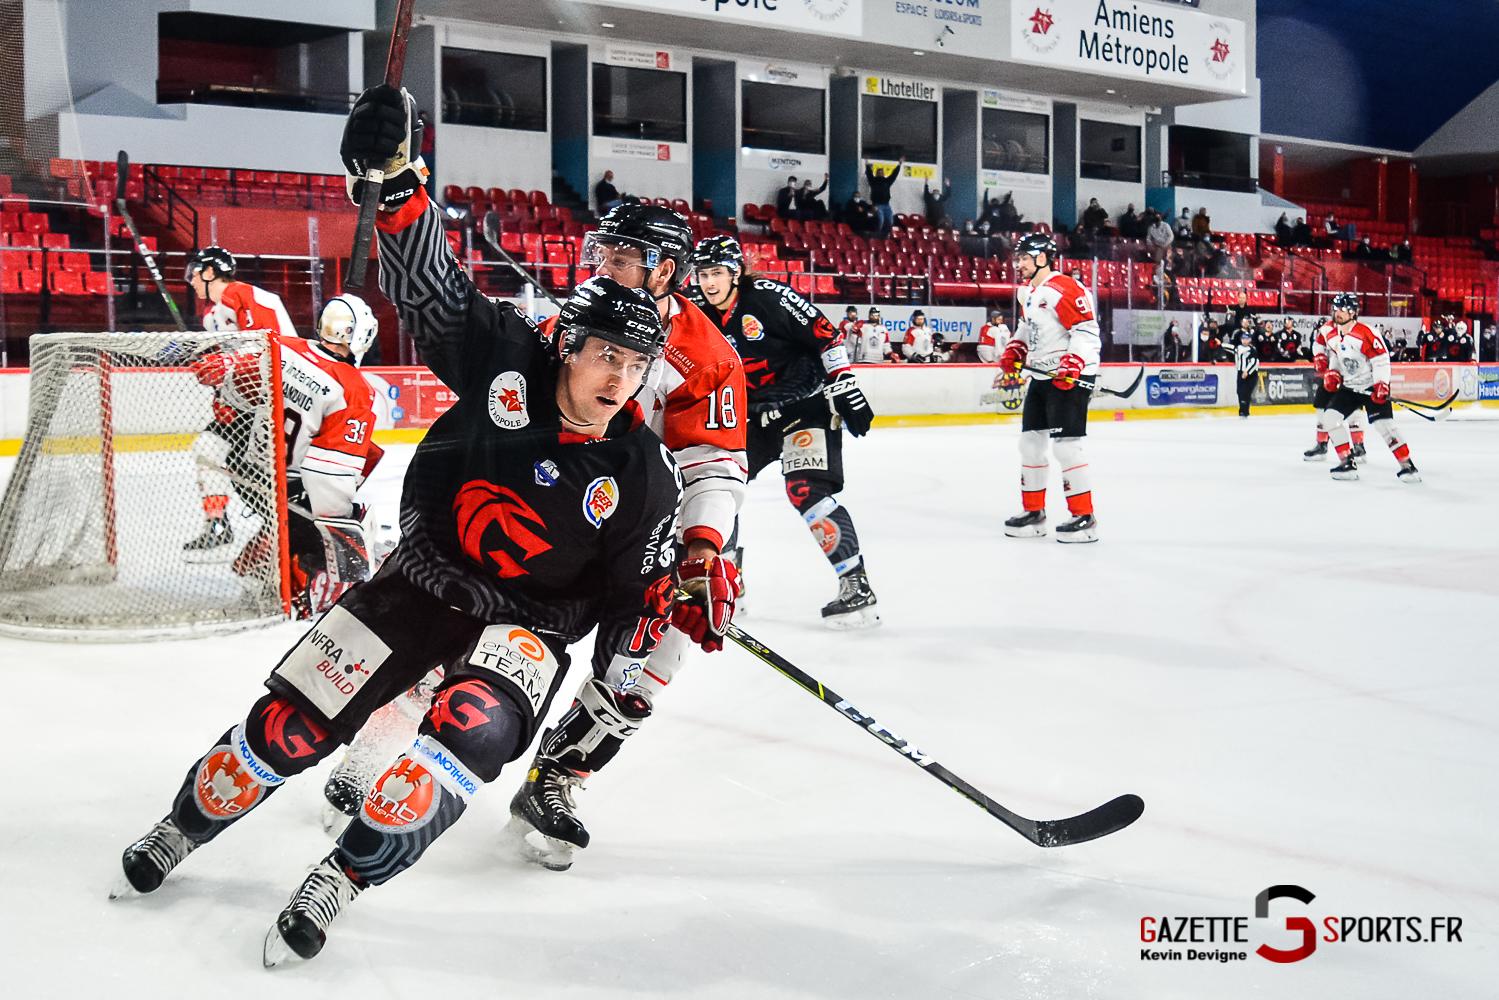 hockey sur glace amiens vs nice 2021 kevin devigne gazettesports 115